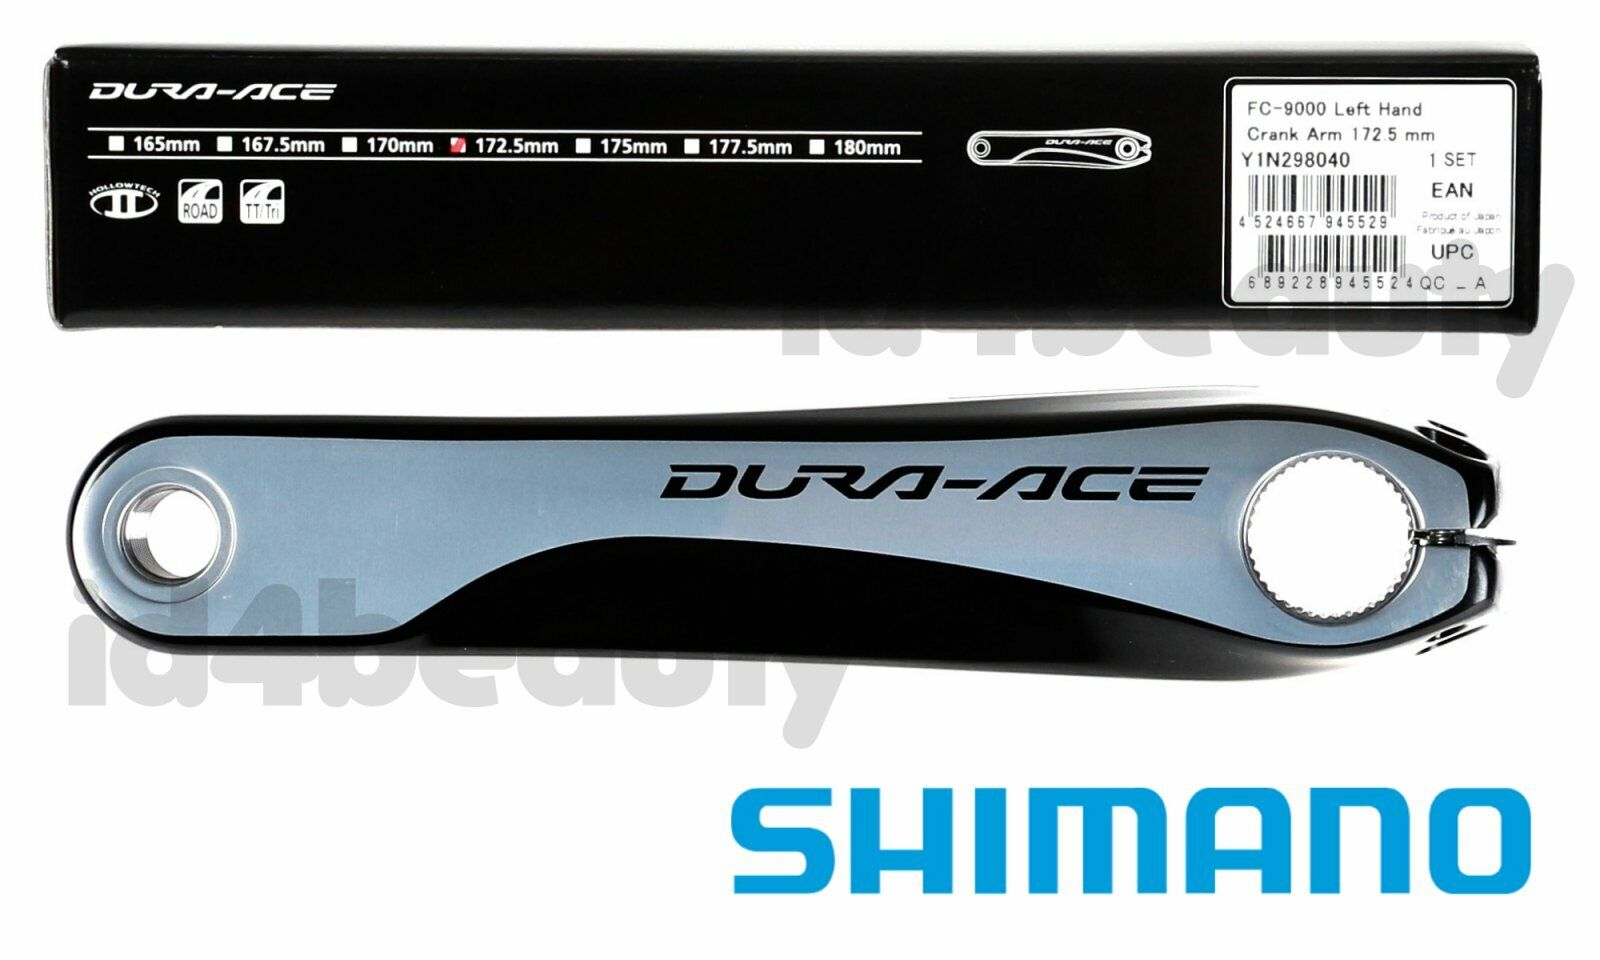 (172.5mm) Shimano Dura Ace FC-9000 Left  Crank Arm New NIB  shop online today